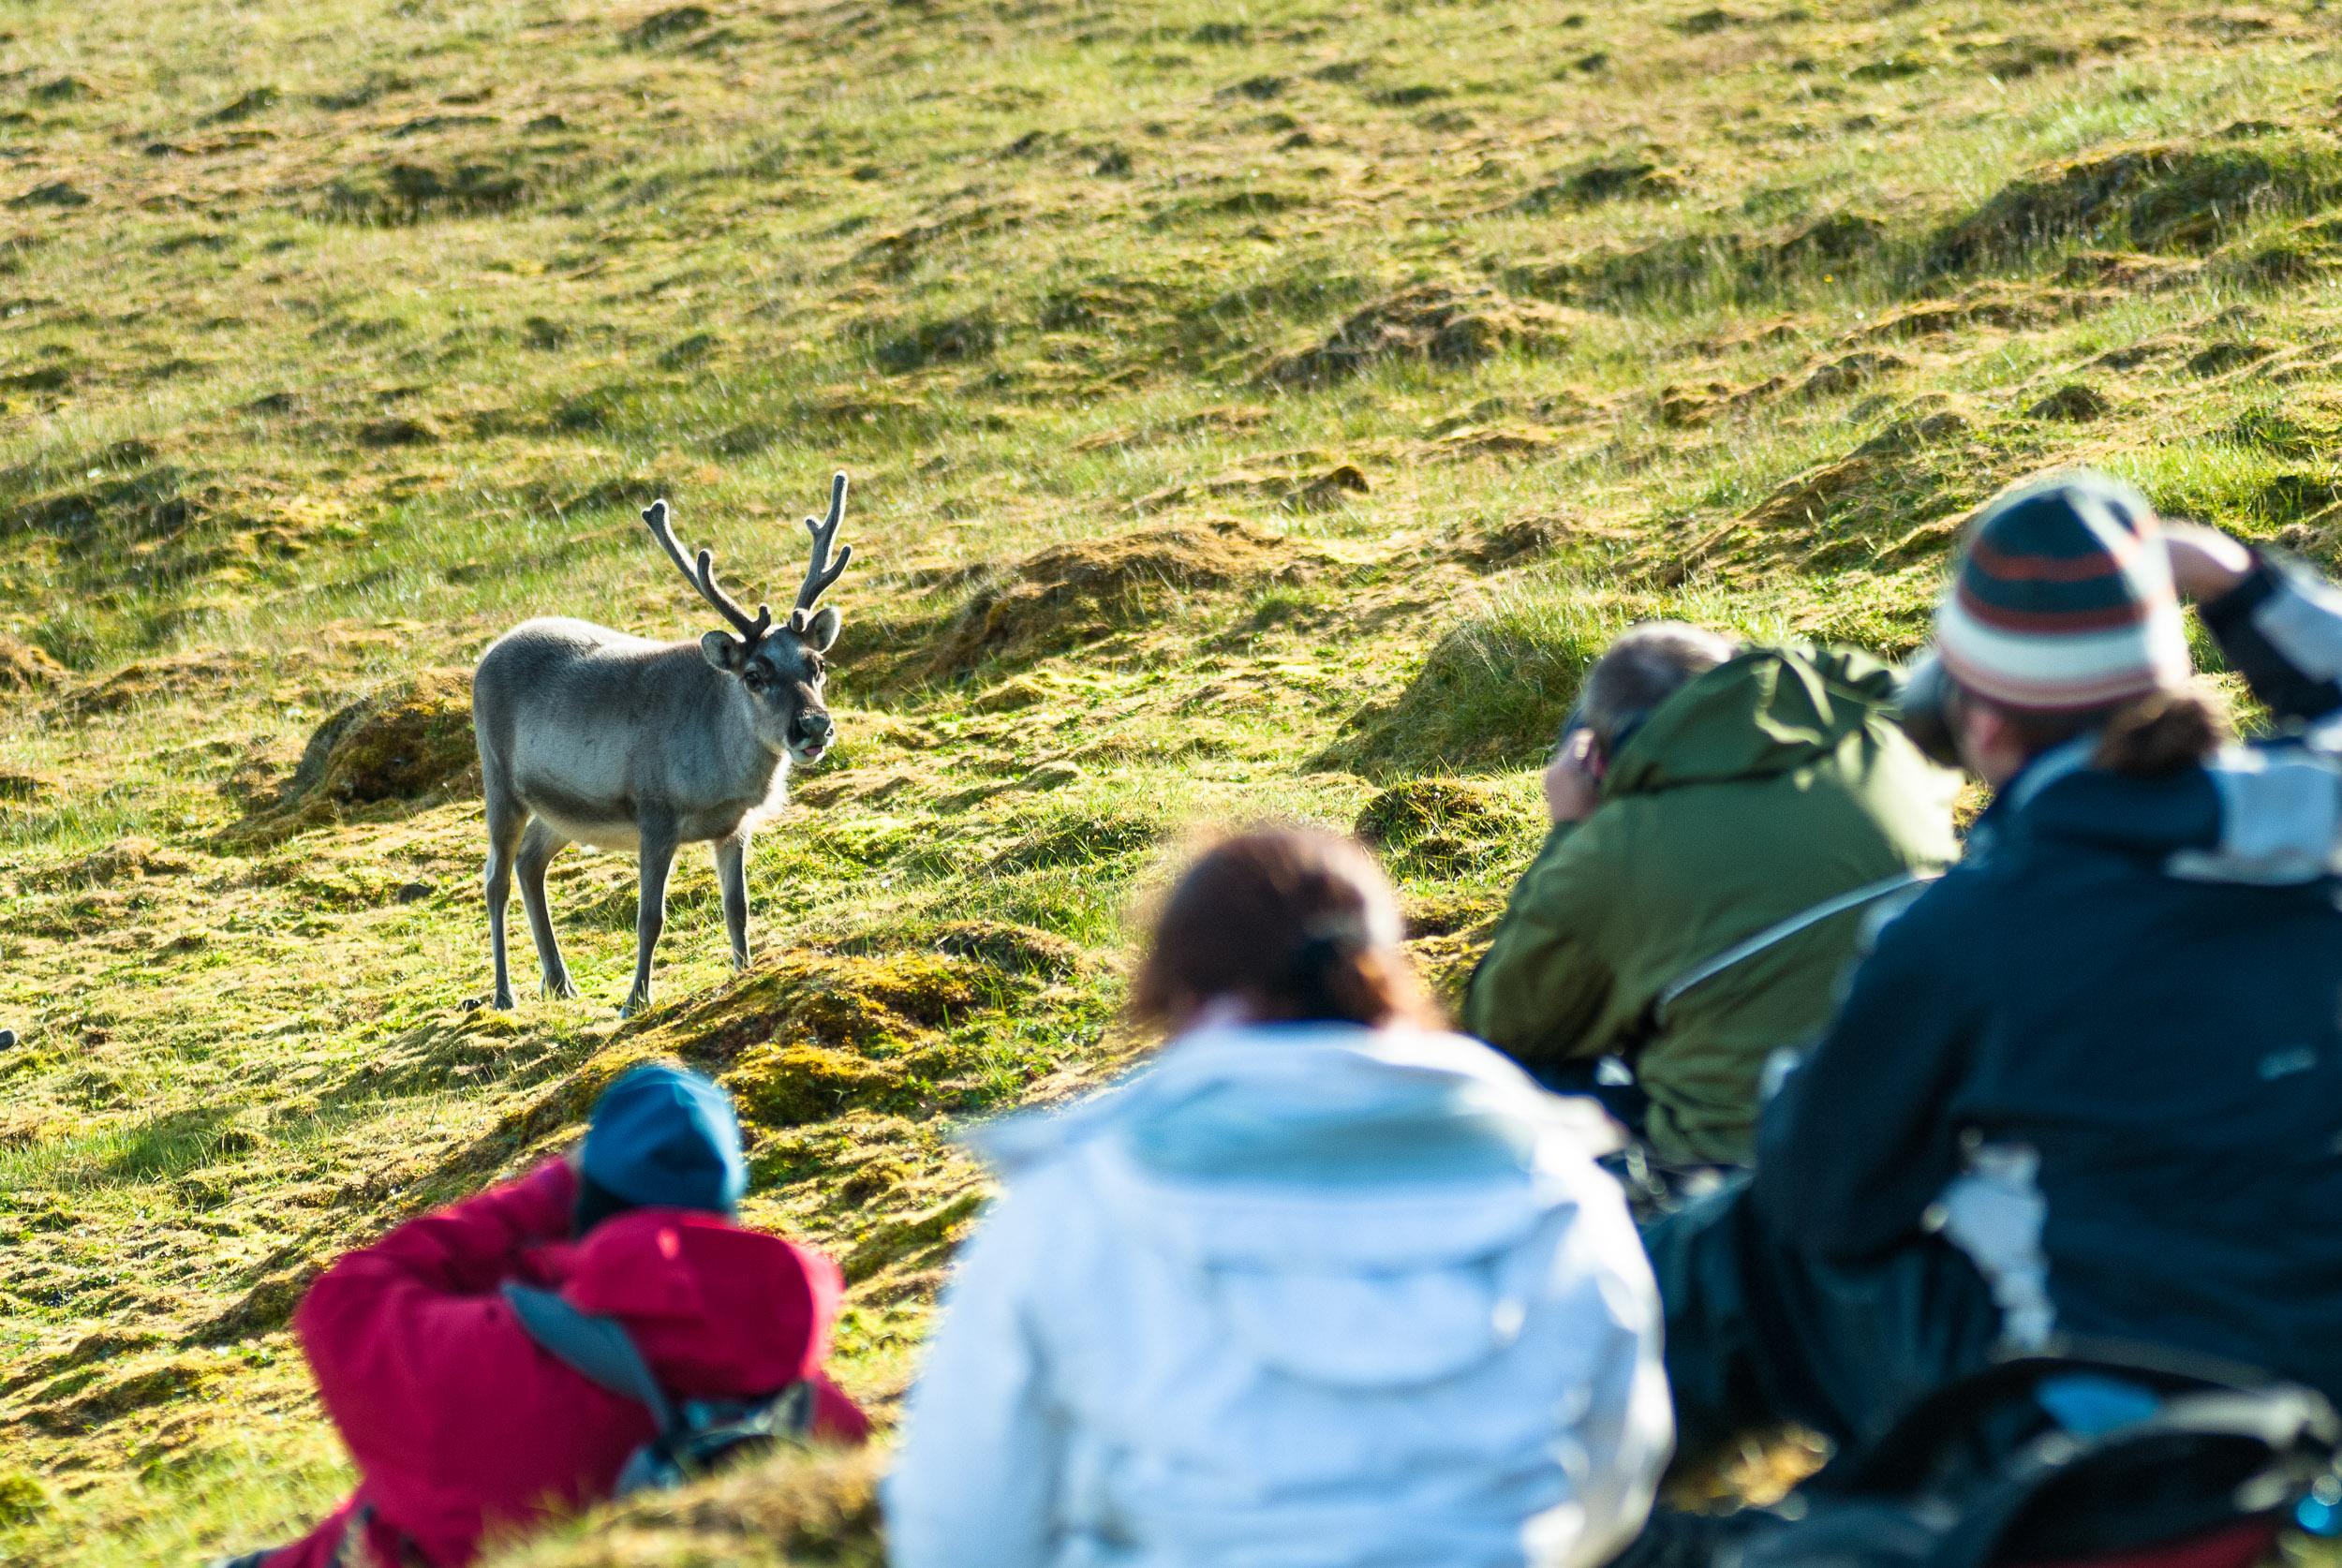 Tourists take photos of a curious Reindeer (Rangifer tarandus), Isfjorden, Oscar II Land, Spitsbergen/Svalbard, Norway. Reindeeer hunting in Spitsbergen/Svalbard was banned in 1925.